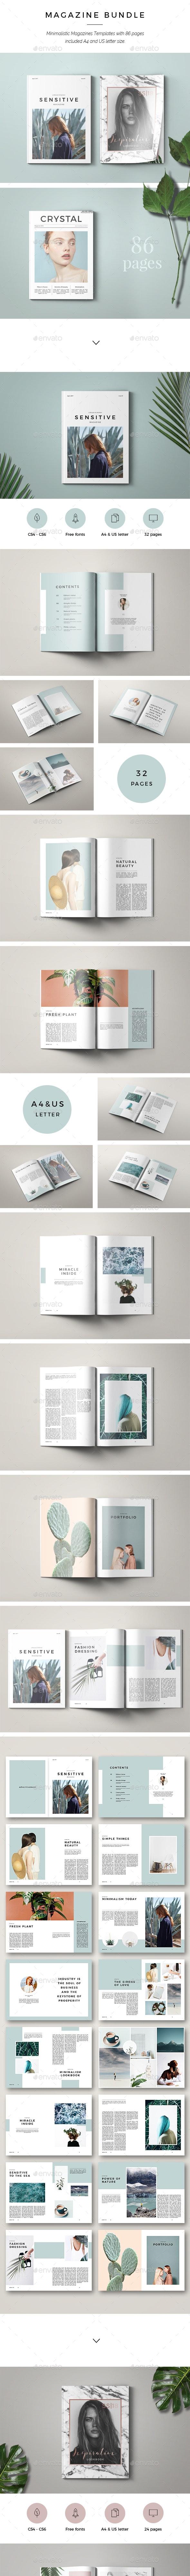 Bundle Magazines 3 in 1 - Magazines Print Templates